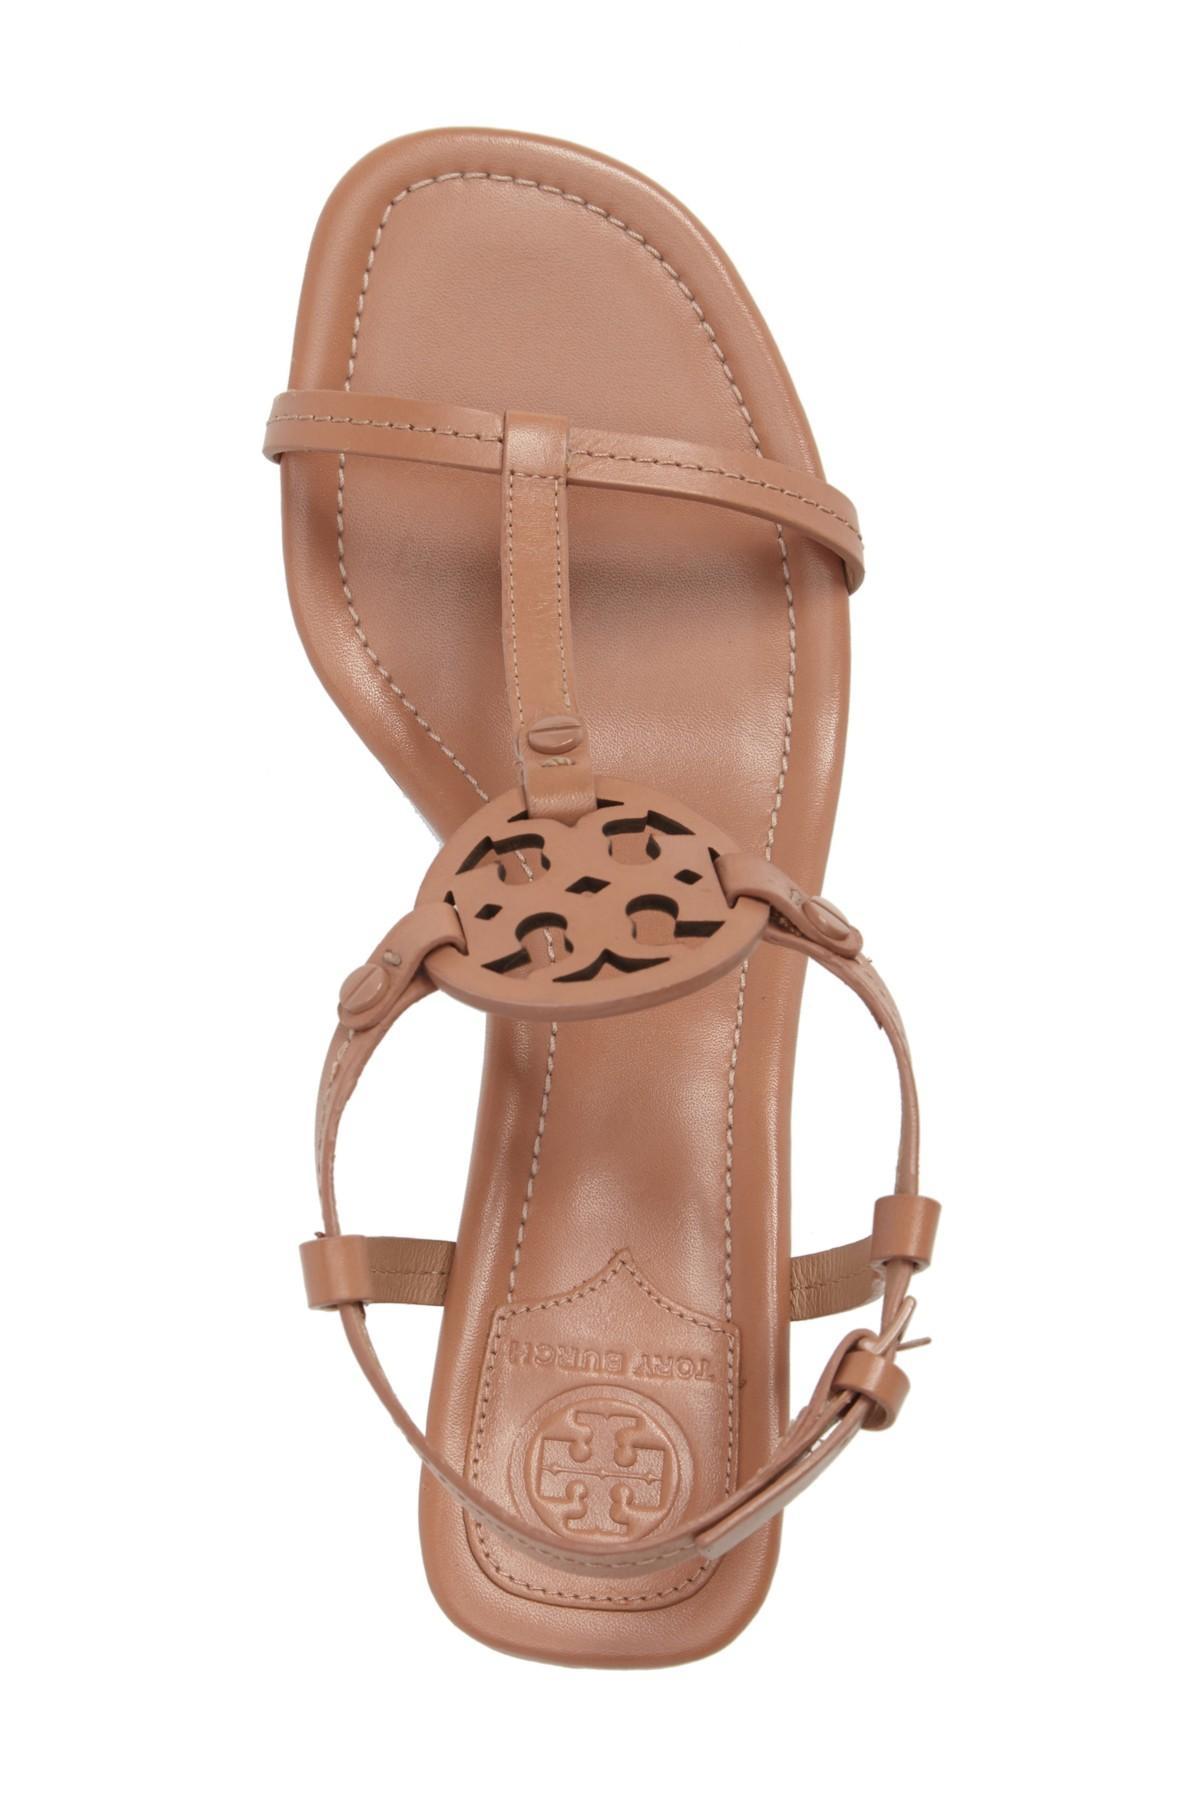 Tory Burch Leather Miller 55mm Sandal Royal Tan Women S